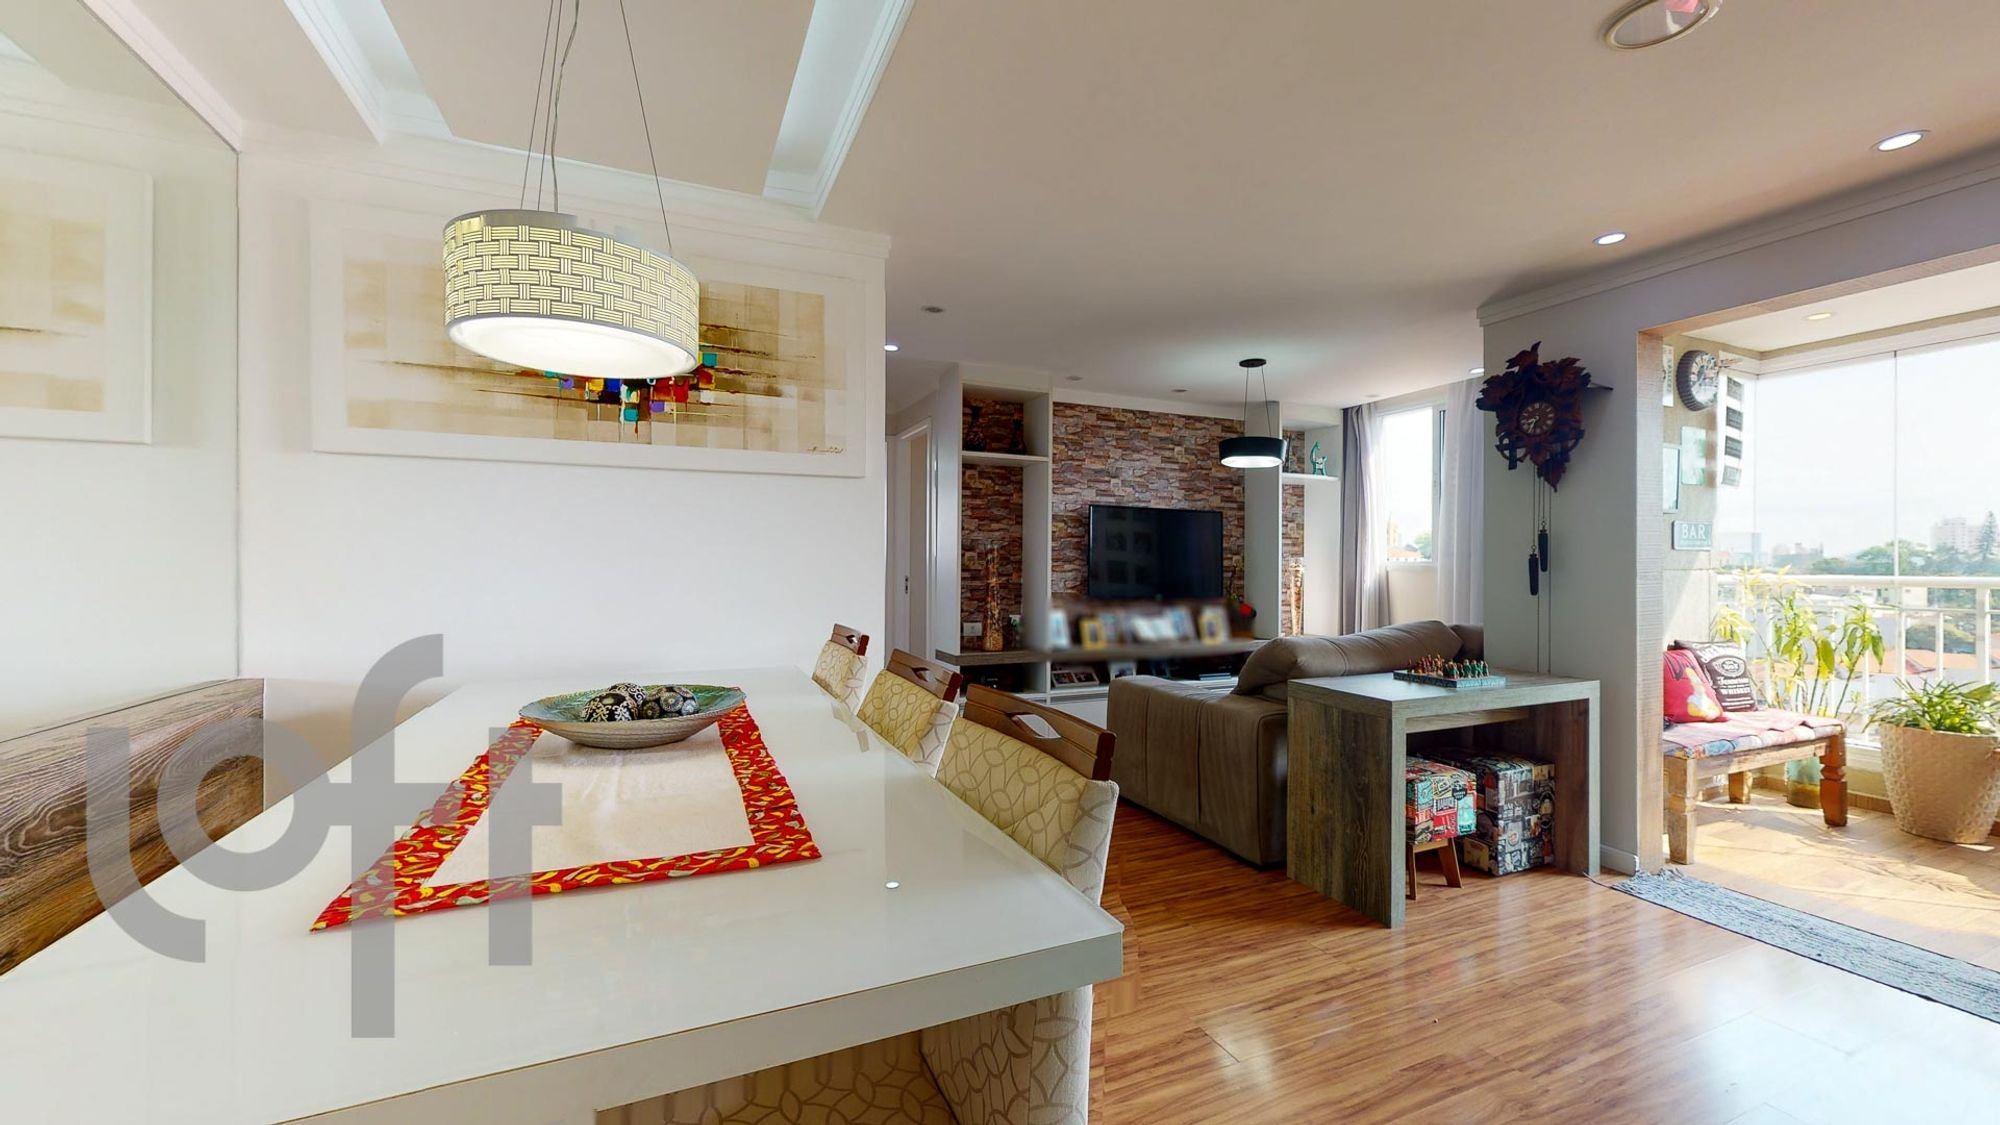 Foto de Sala com vaso de planta, sofá, banco, tigela, cadeira, mesa de jantar